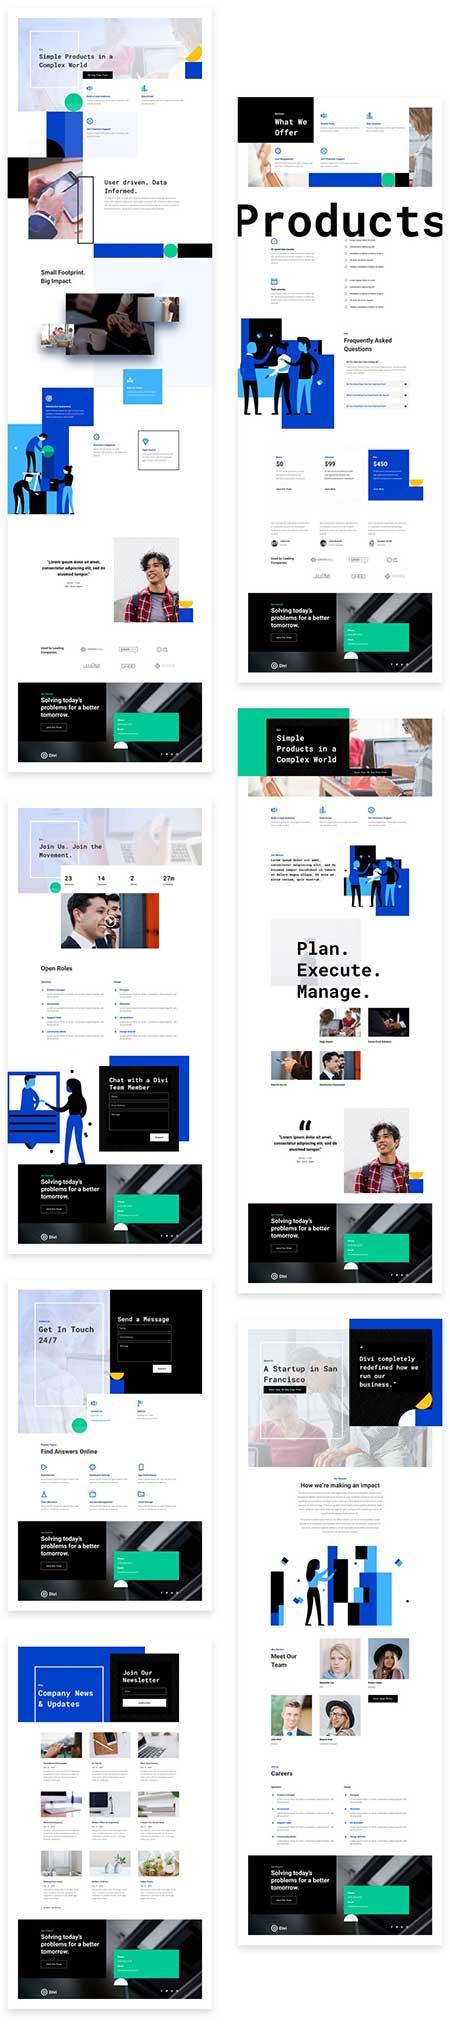 Startup website template